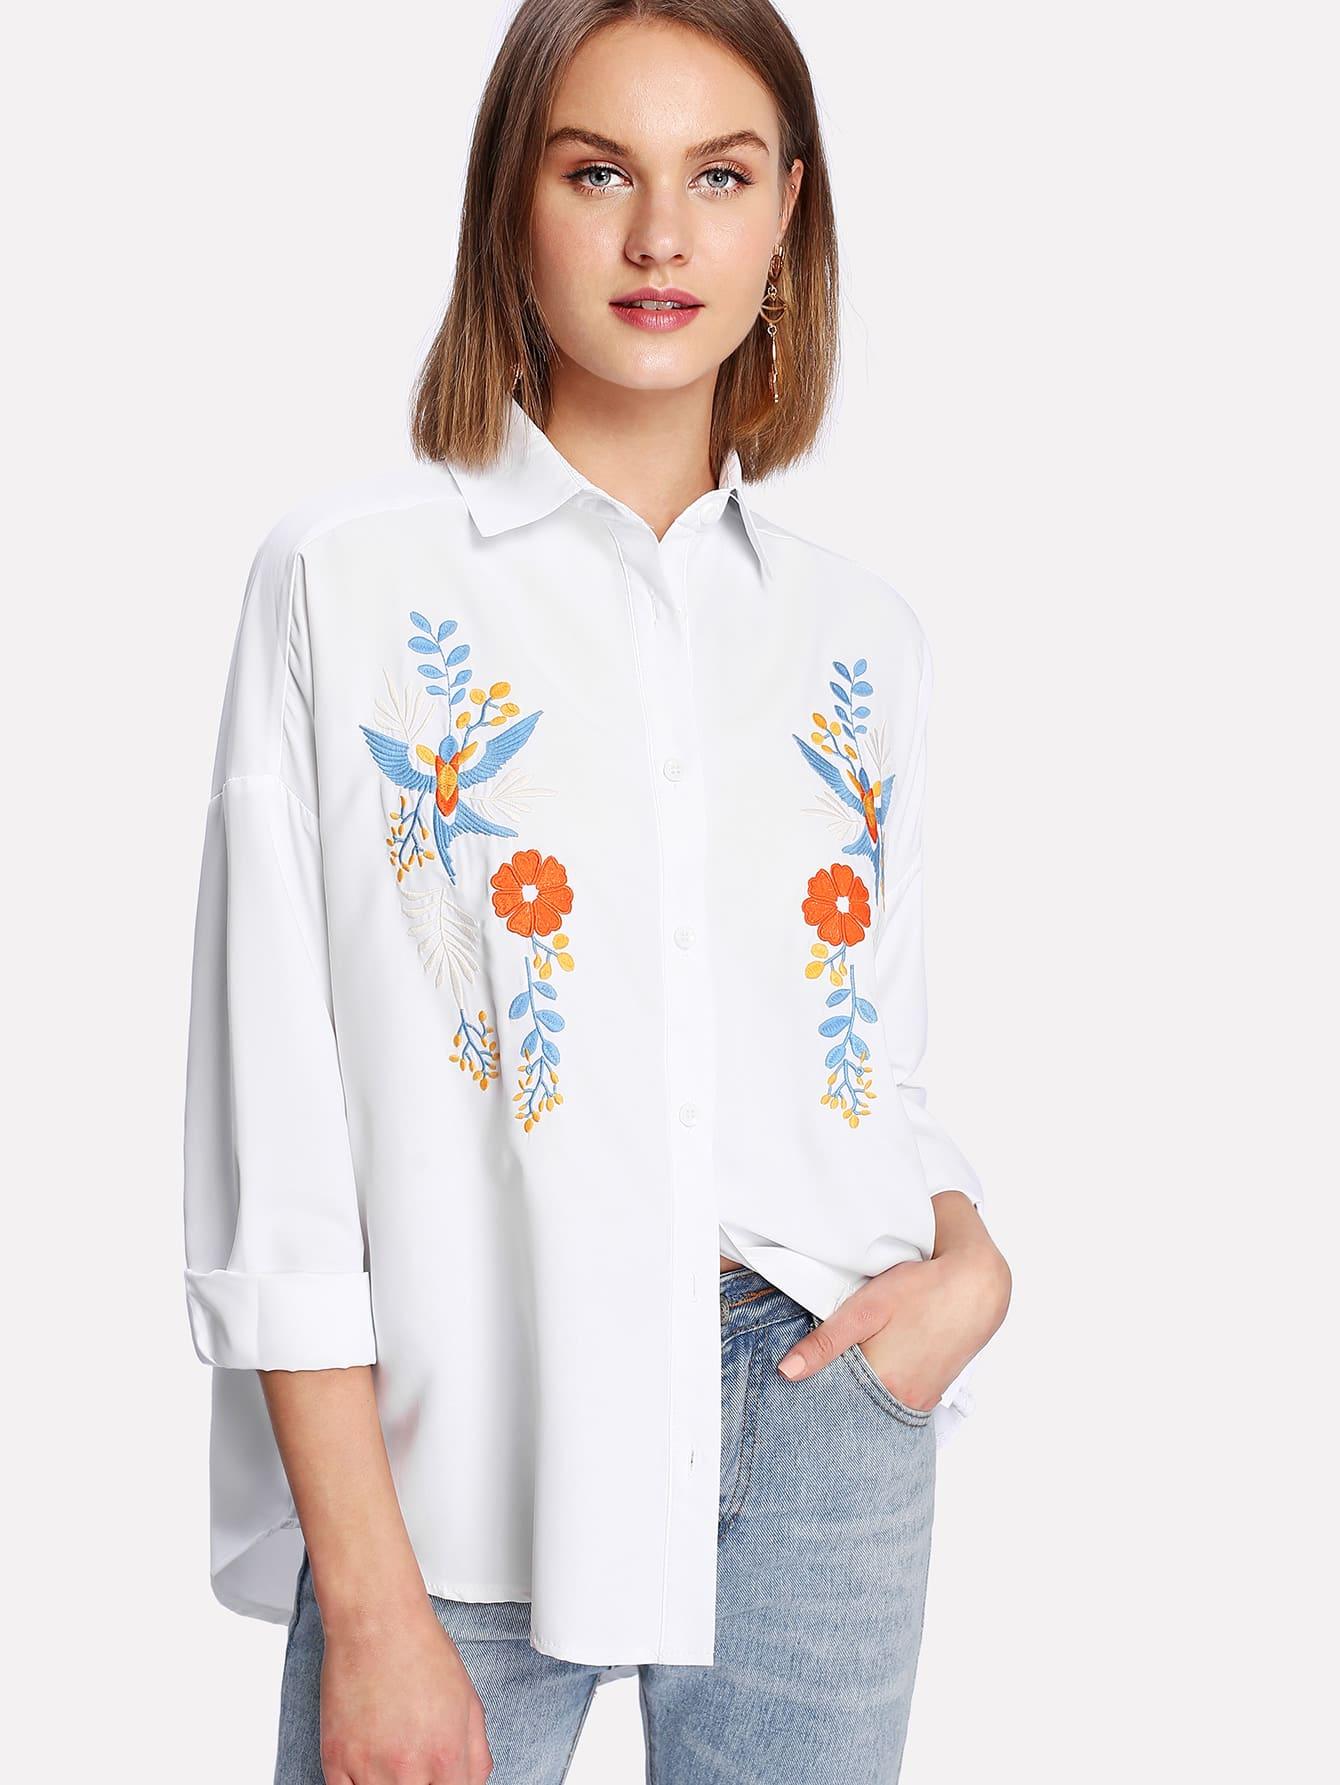 Symmetric Embroidered Blouse джеймс эшер bhakta ranga rasa india новый взгляд mp3